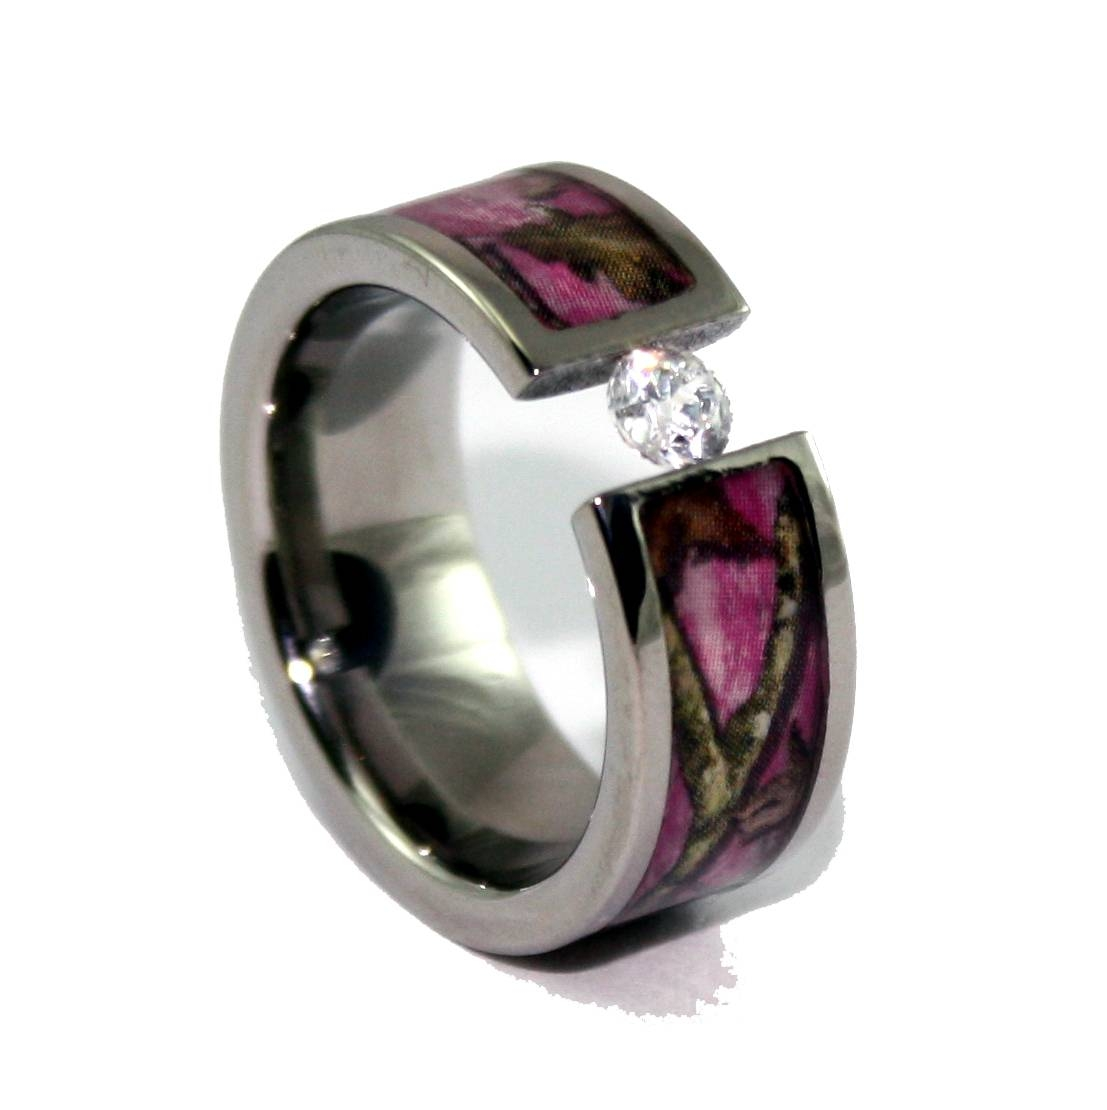 Choose Pink Camo Wedding Rings For Eternal Love | Wedding Ideas Regarding Camo Wedding Bands (View 9 of 15)